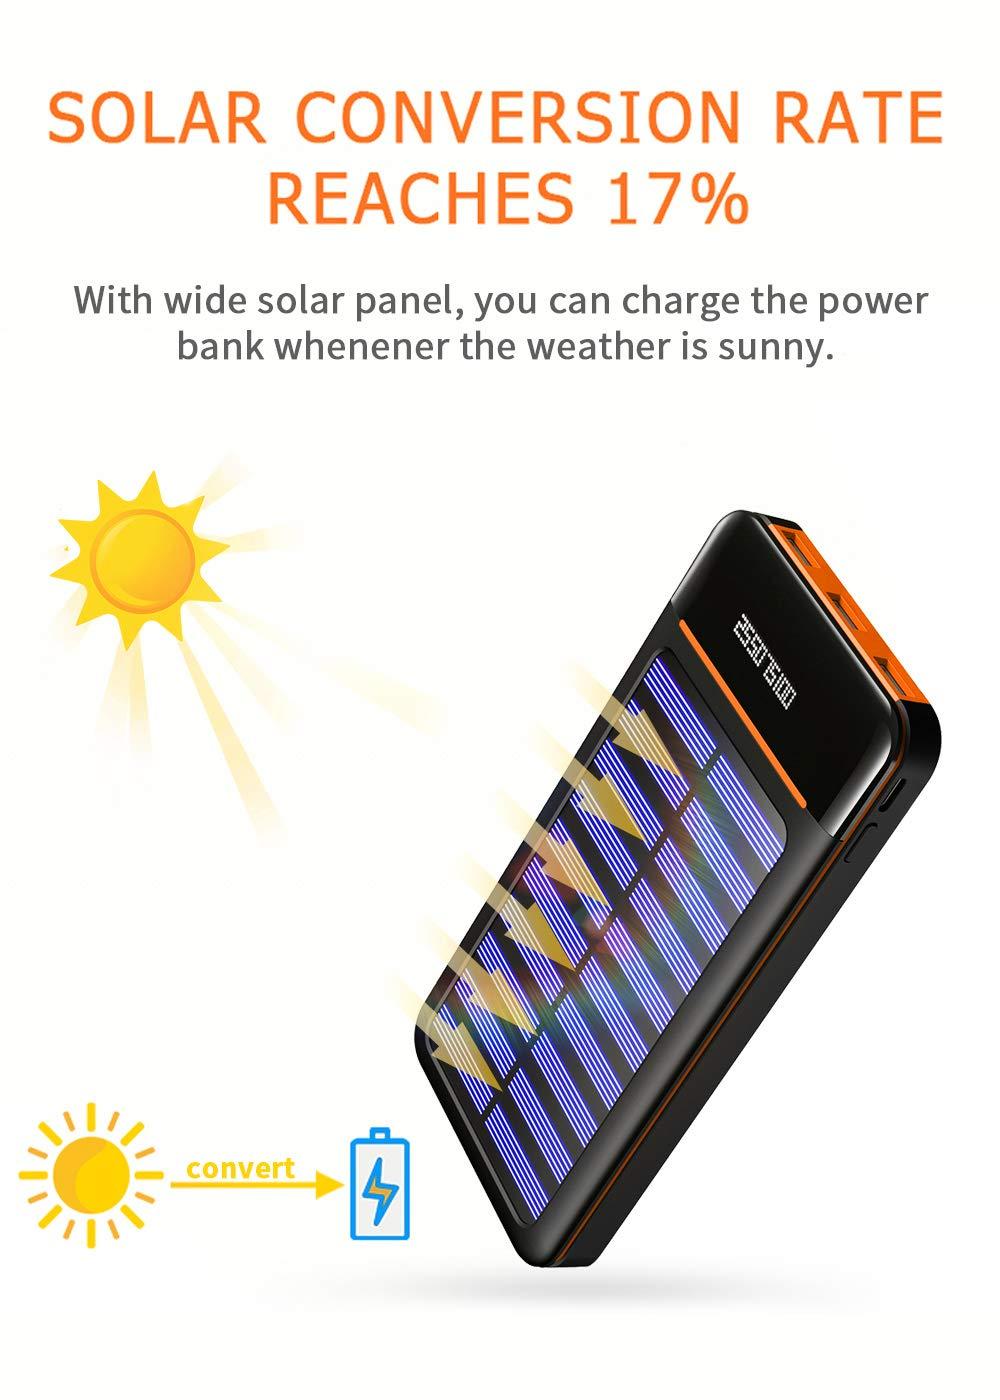 Amazon.com: Cargador solar portátil de alta capacidad de ...